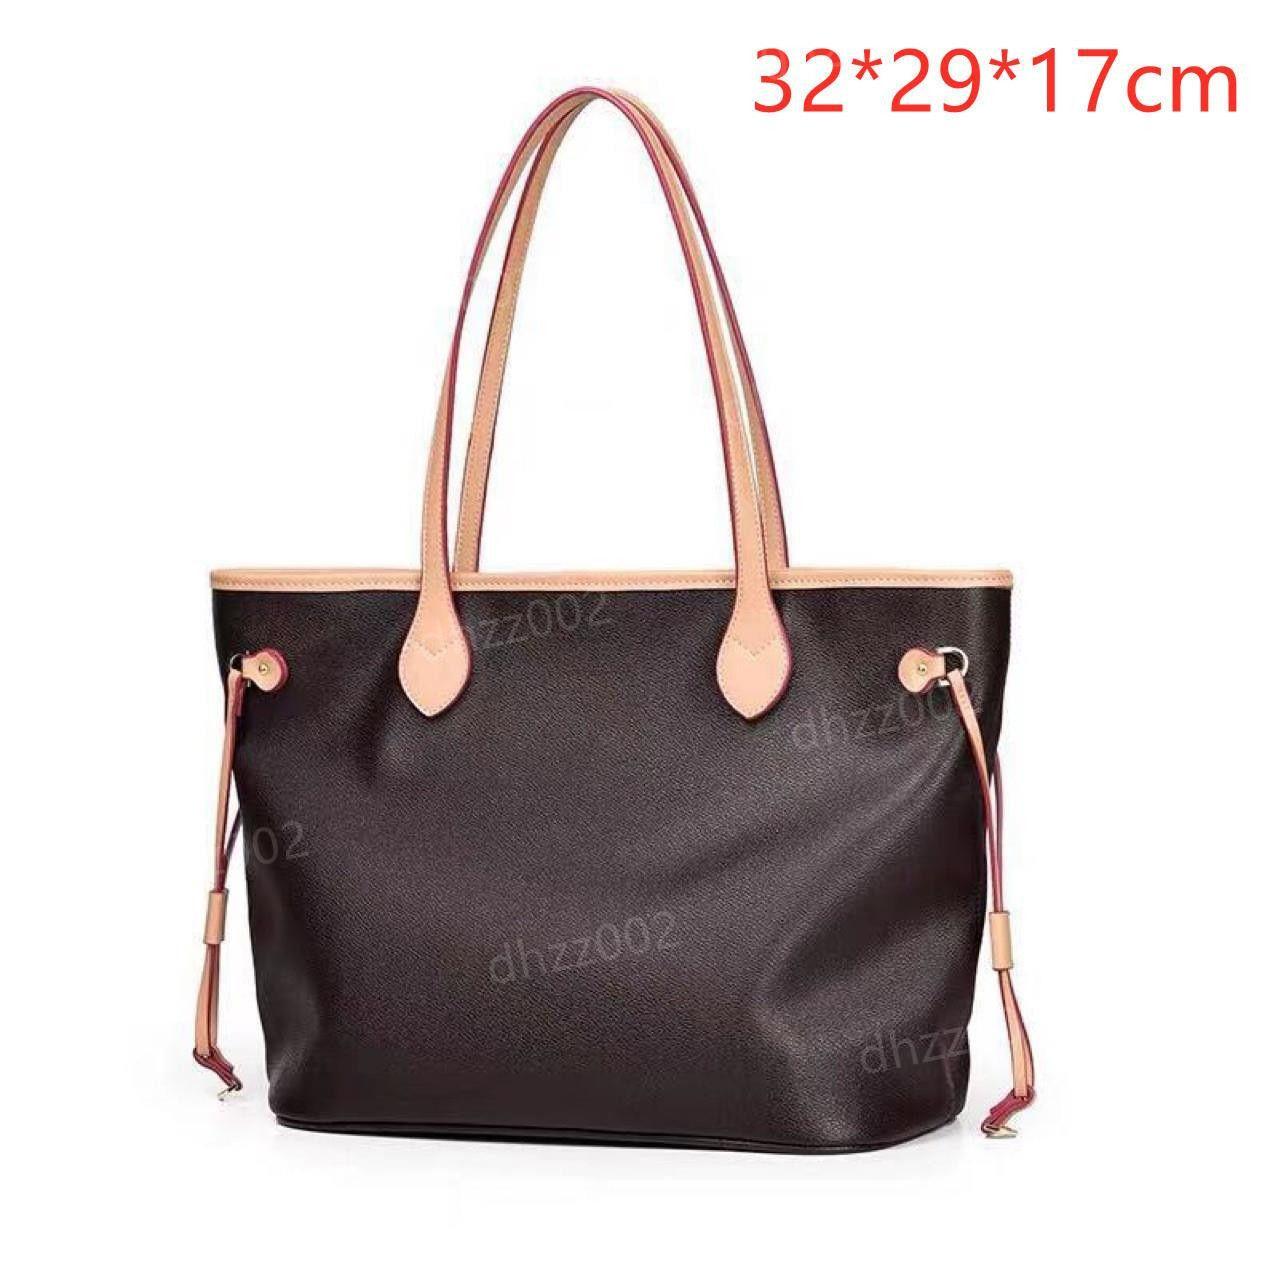 Louis Vuitton 2021 Brand New Ombro Bolsas Luxo Handbags Carteiras de Alta Qualidade para Mulheres Bag Designer Totes Messenger Bags Cross Body Ergsdger